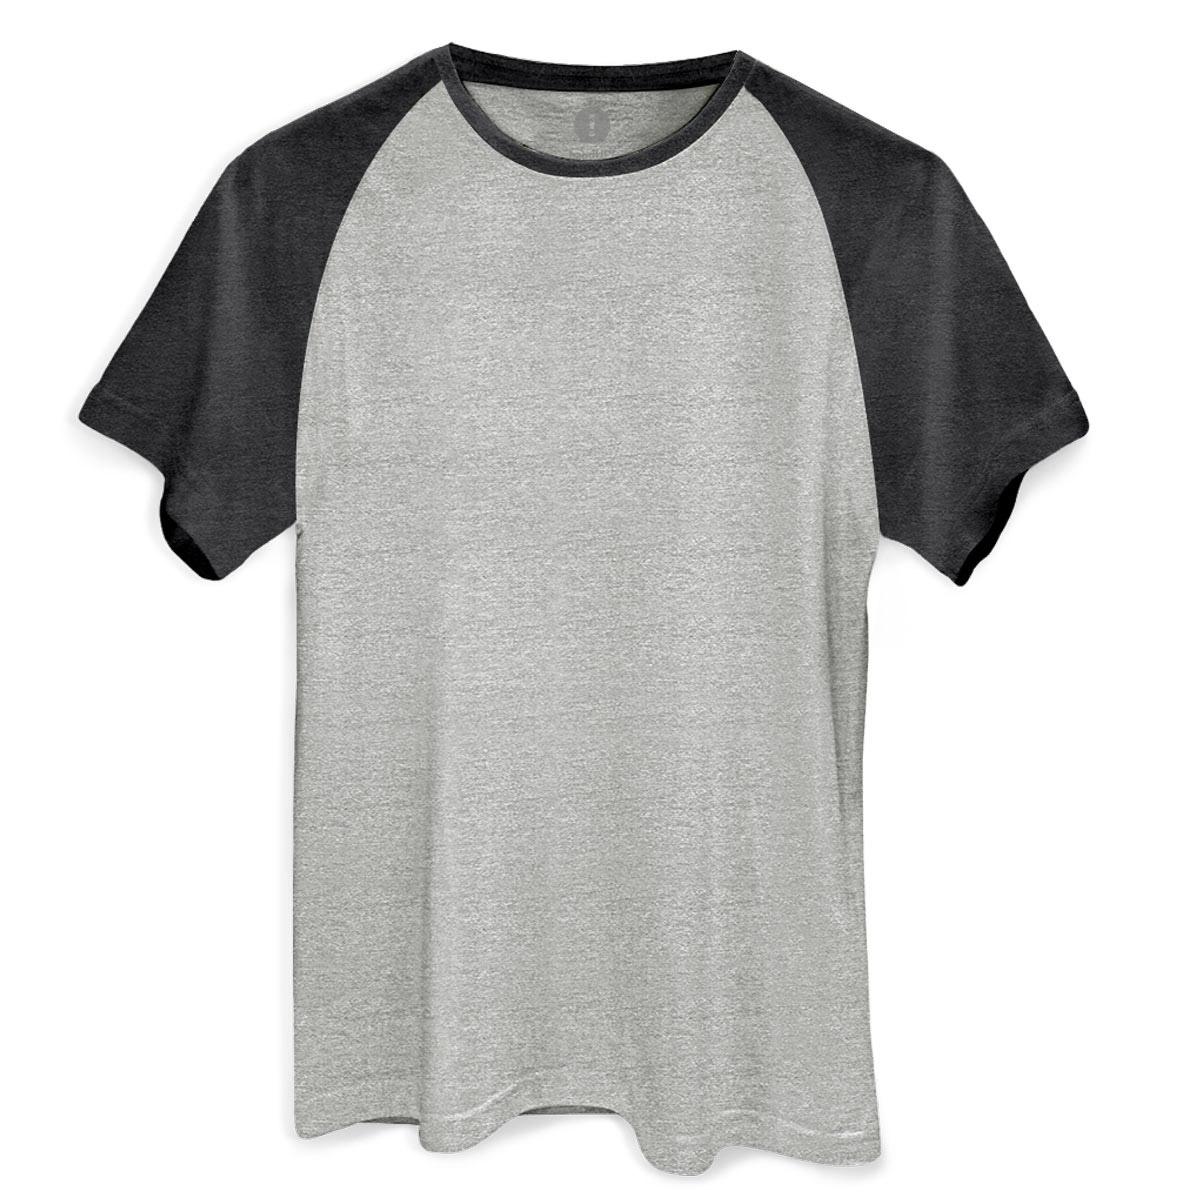 Camiseta Raglan Premium Masculina Mescla Claro e Mescla Escuro